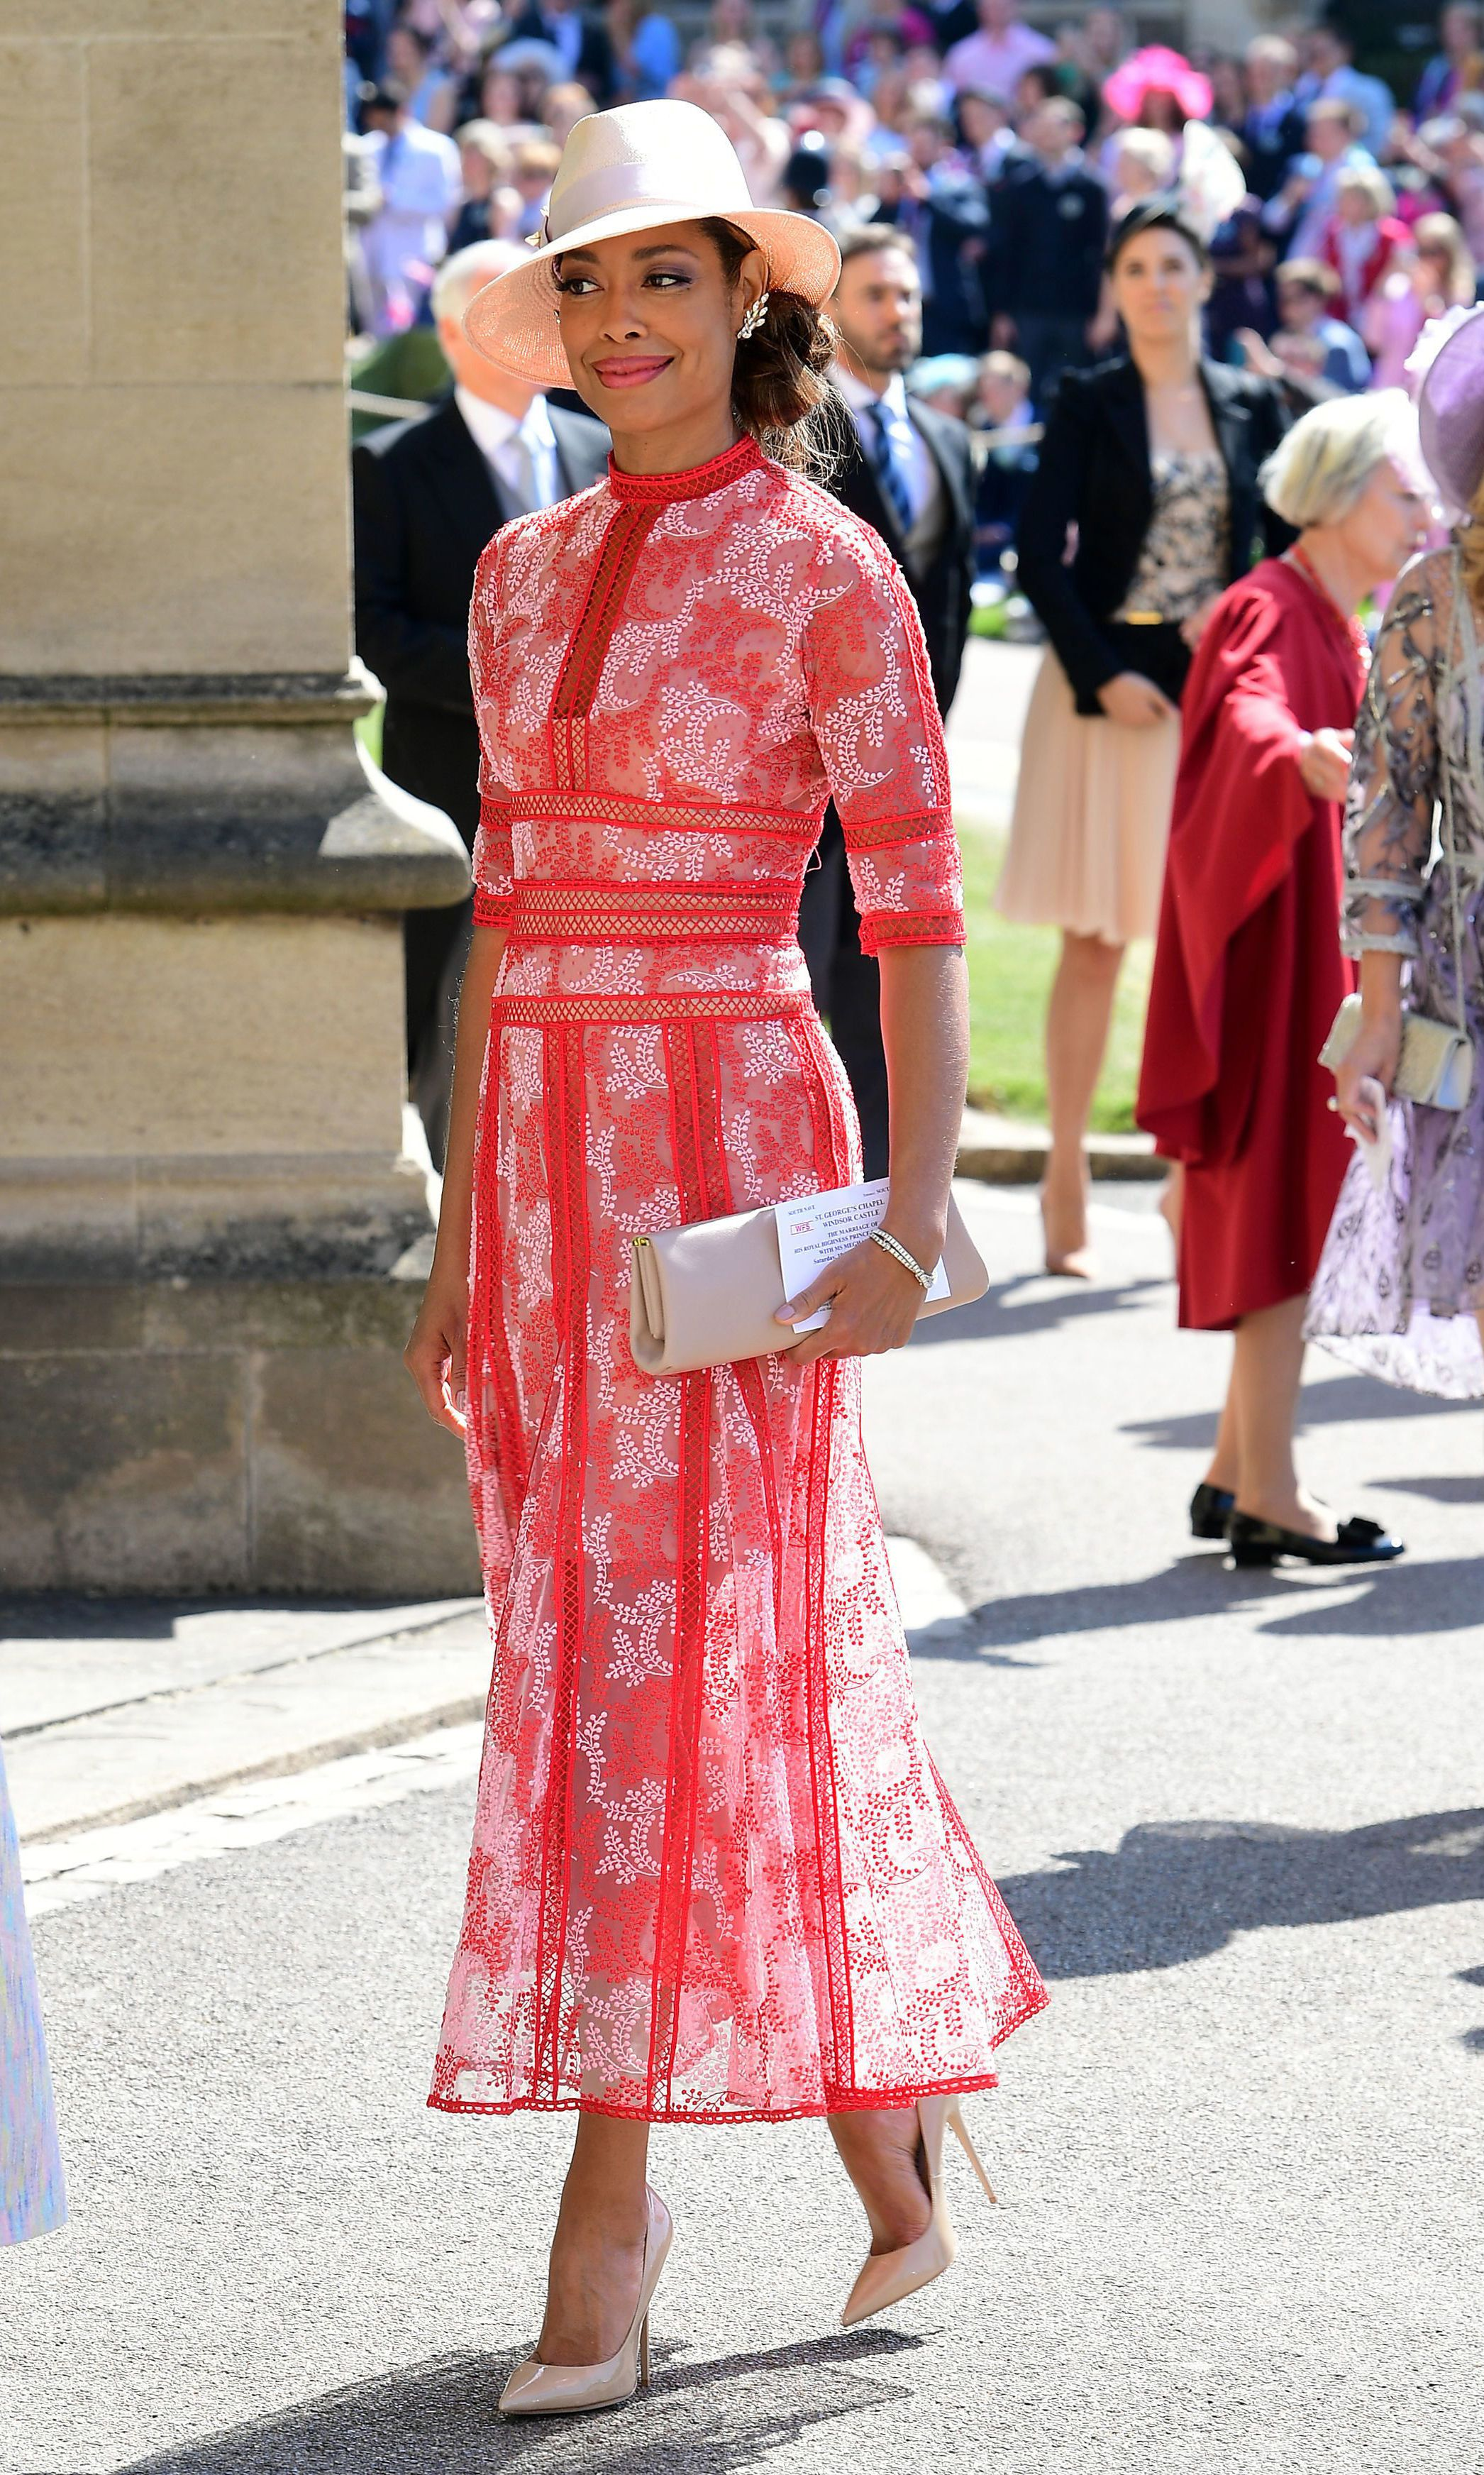 Asombroso Vestido De Novia Plymouth Viñeta - Colección de Vestidos ...